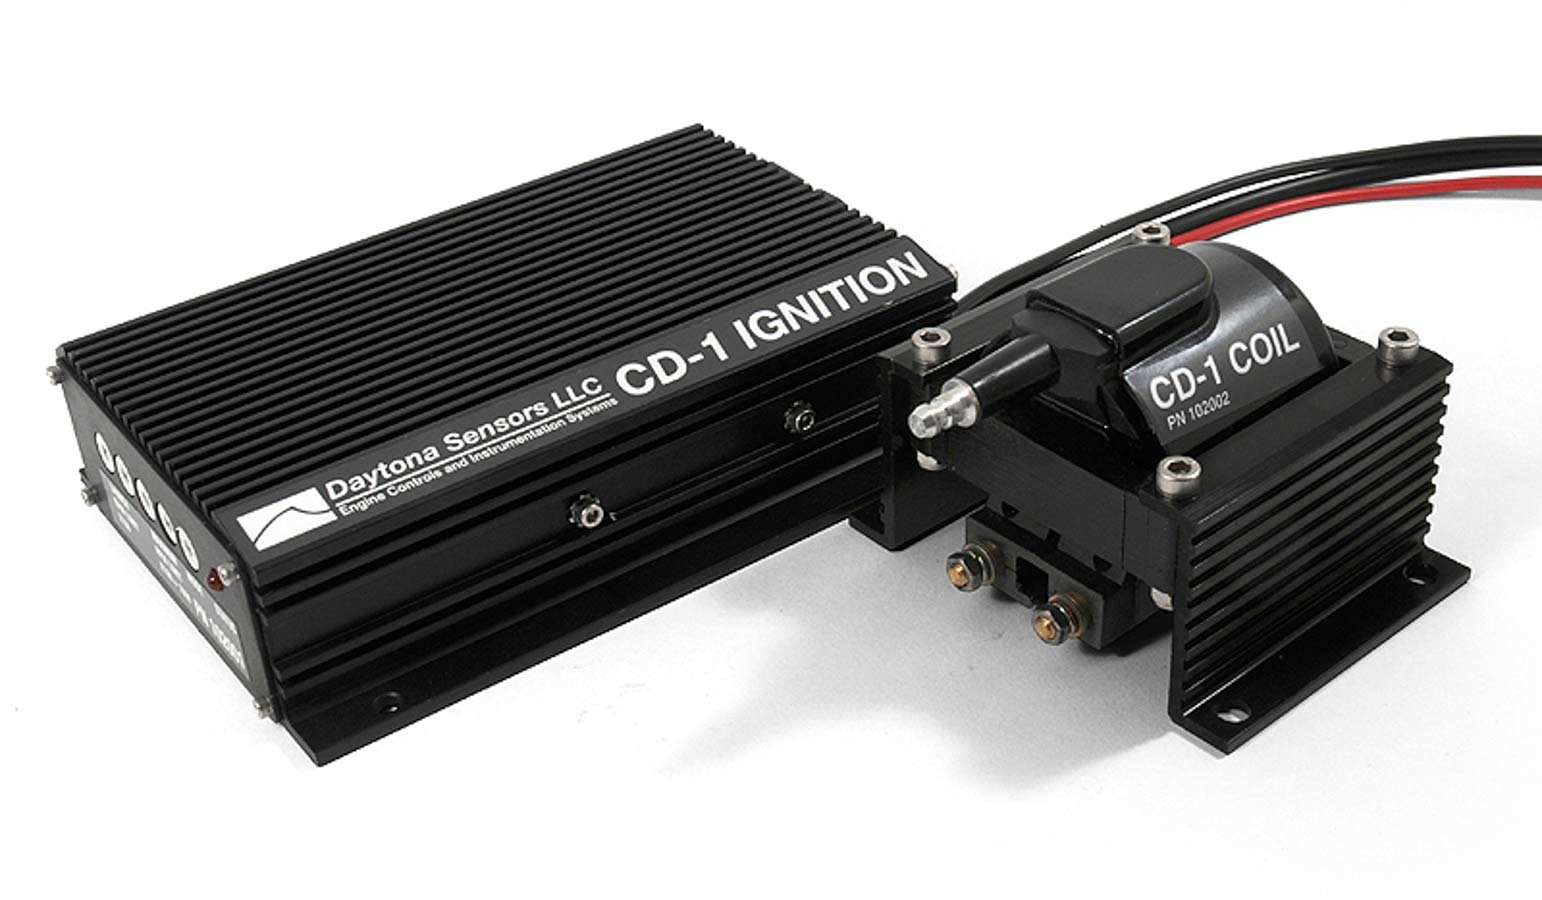 CD-1 Ignition System Kit